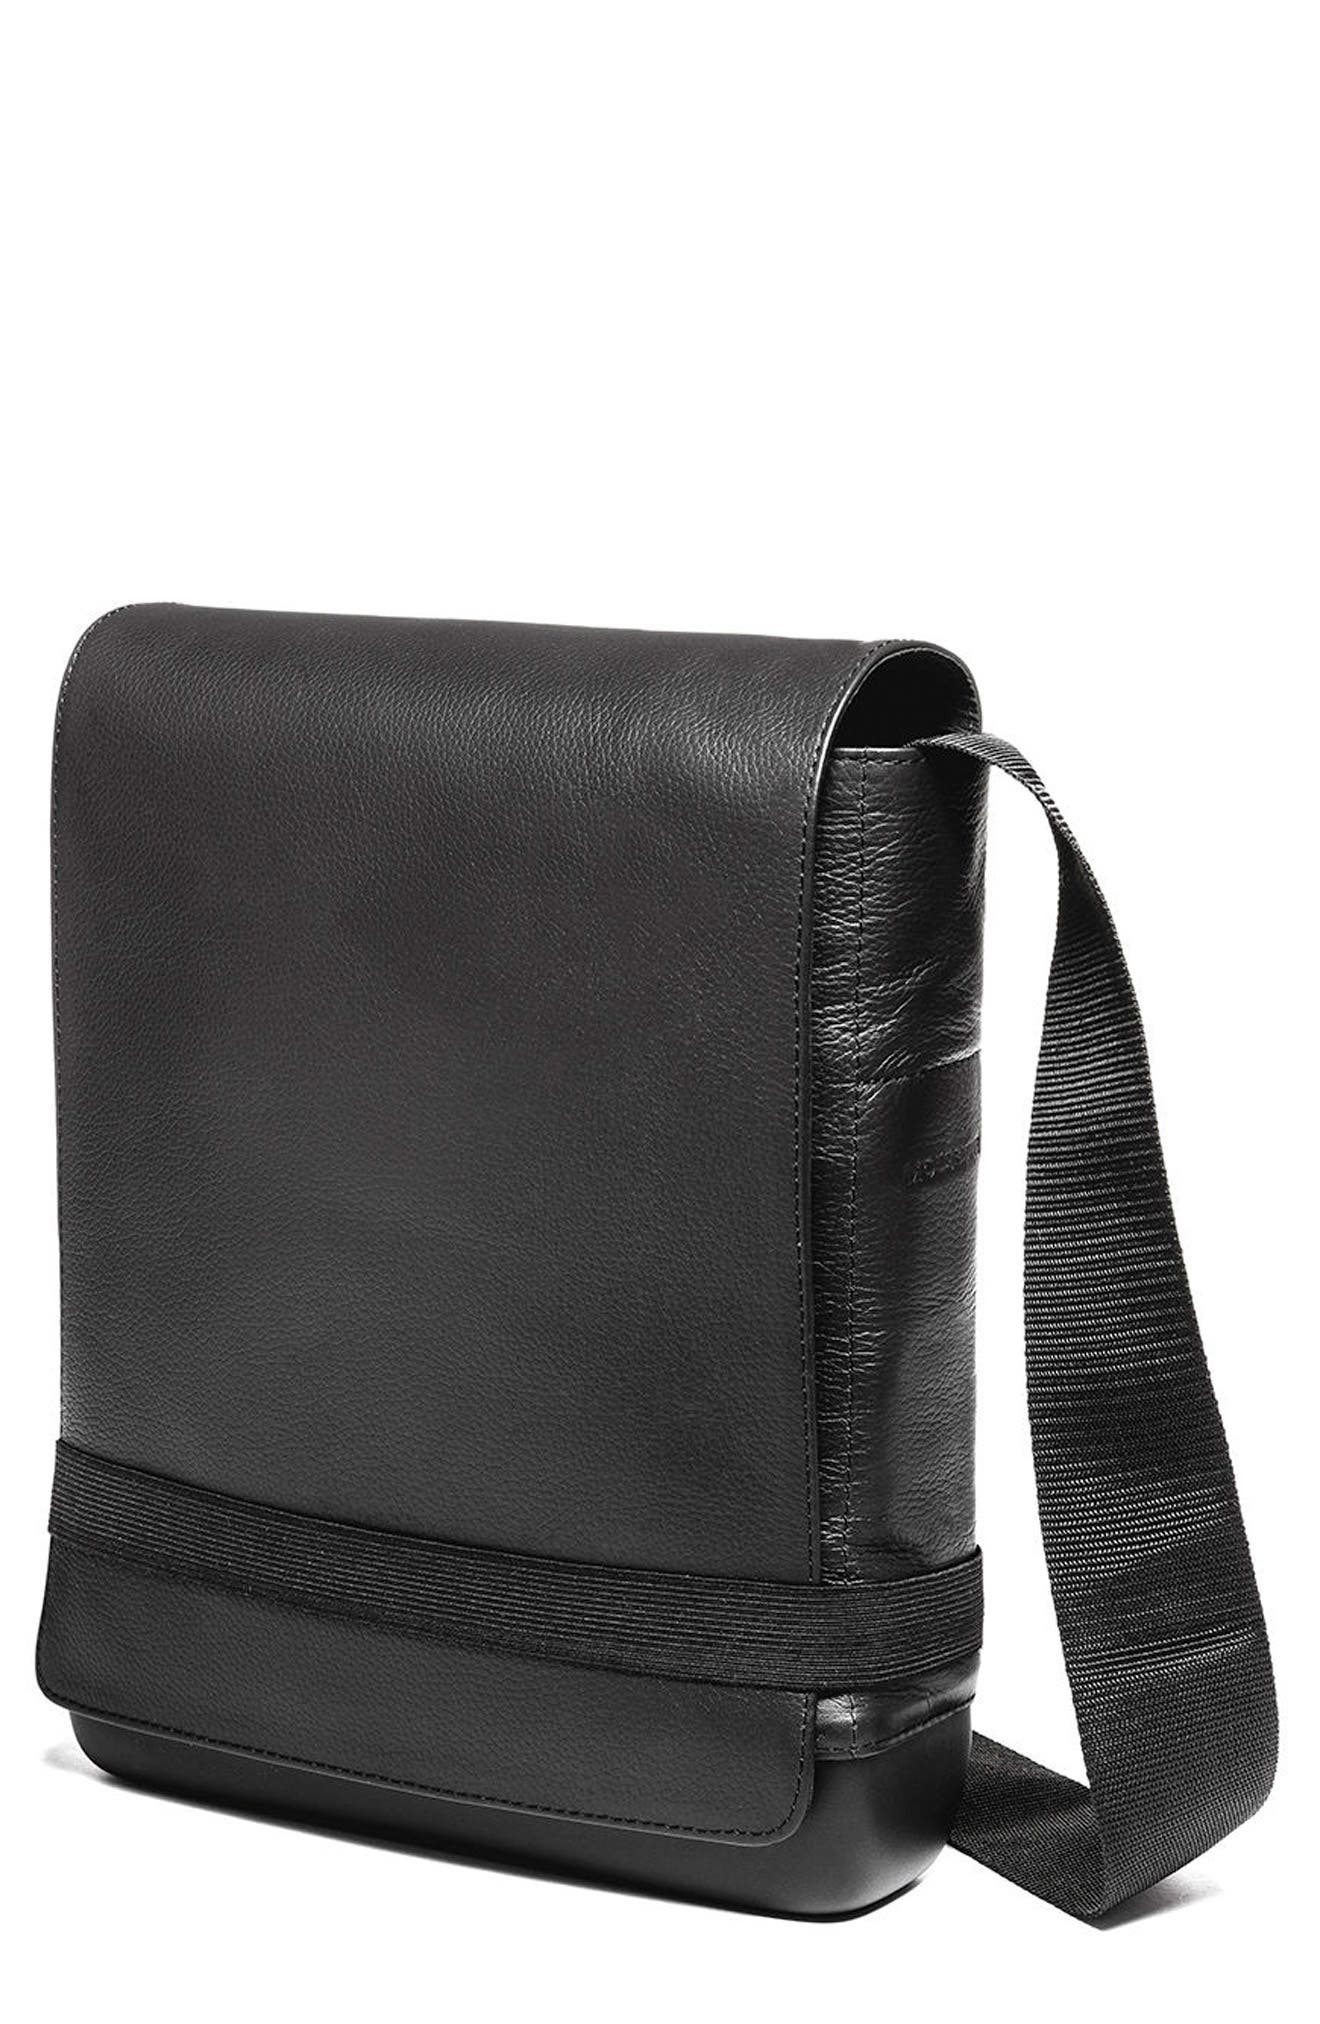 Main Image - Moleskine Leather Reporter Bag